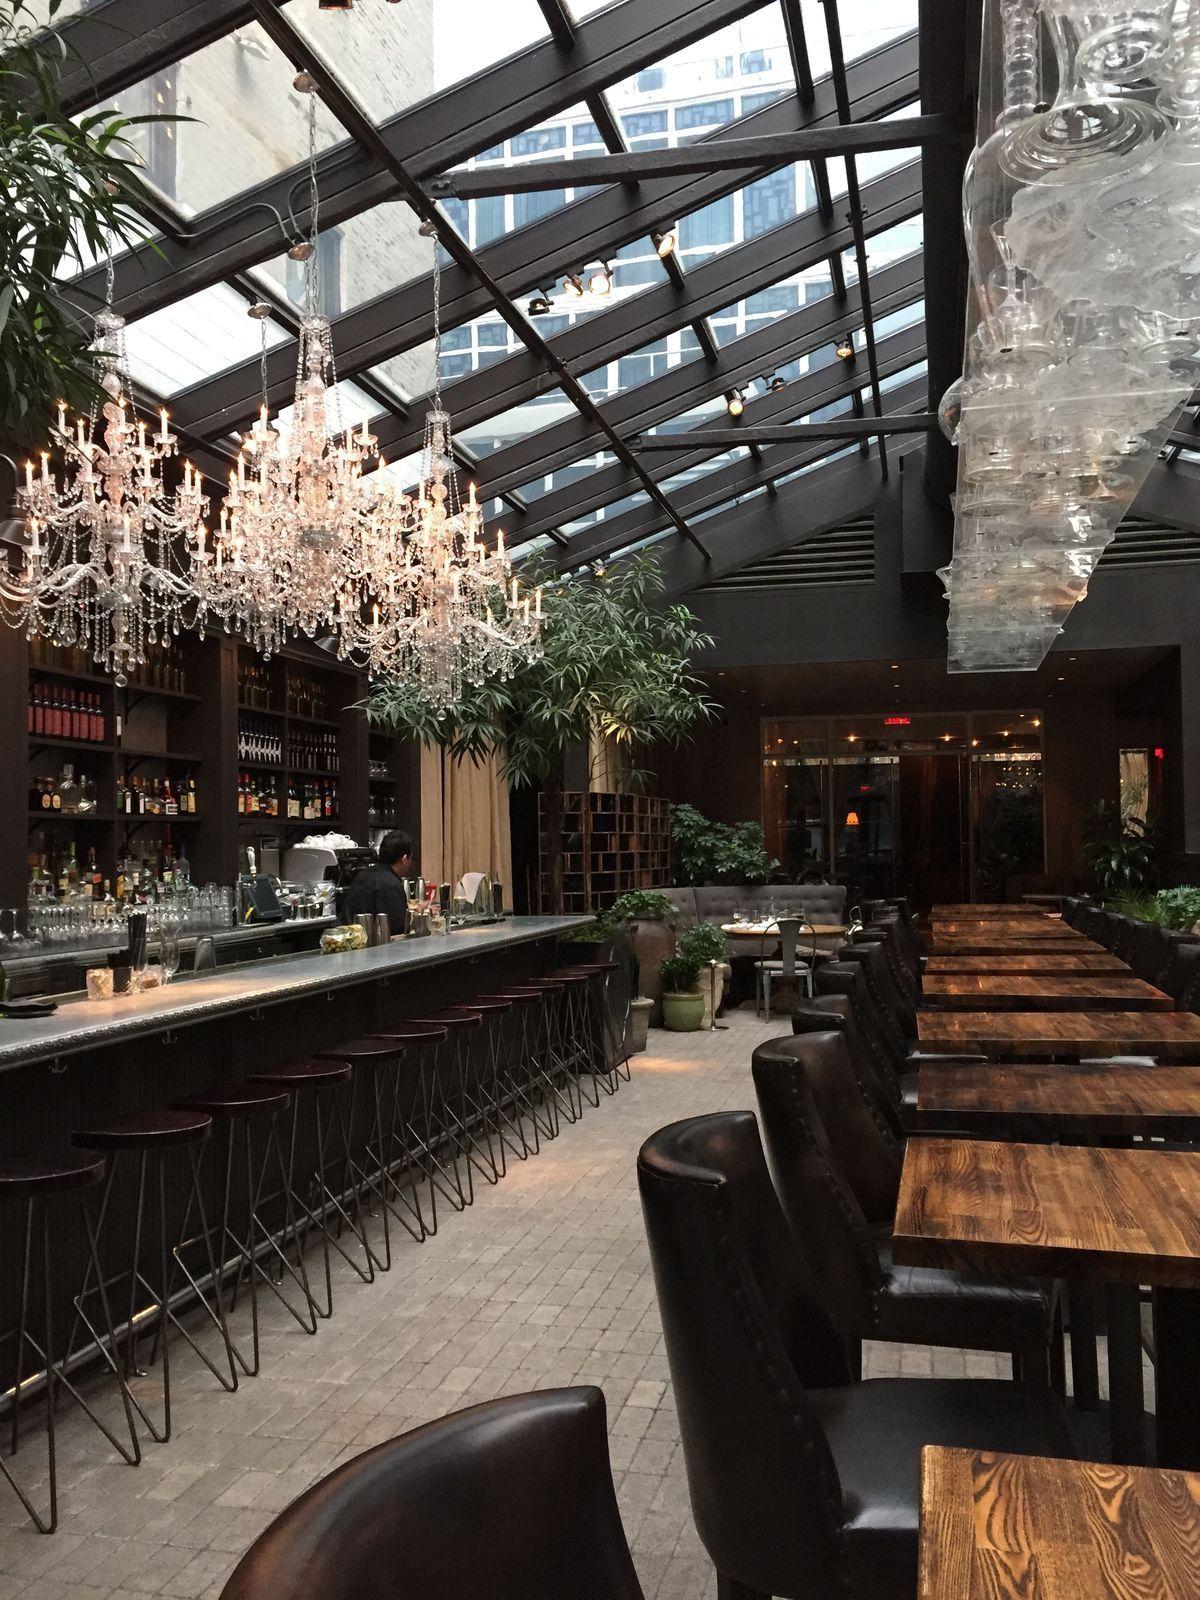 Cool Idea For Bar And Natural Lighting Bar Design Restaurant Coffee Shop Design Cafe Interior